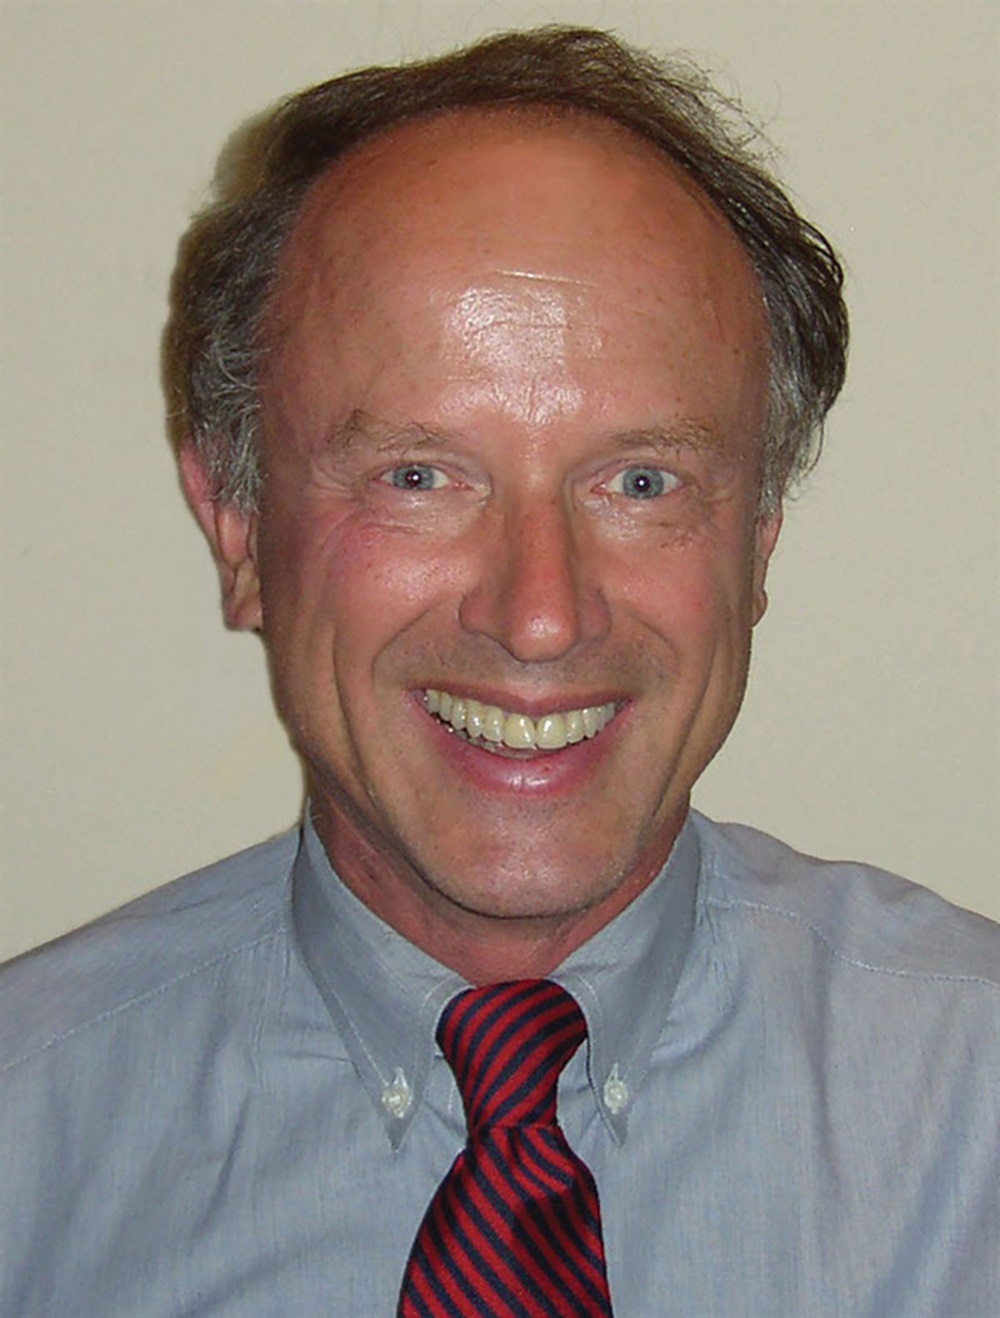 Dr. Joe Whitehouse